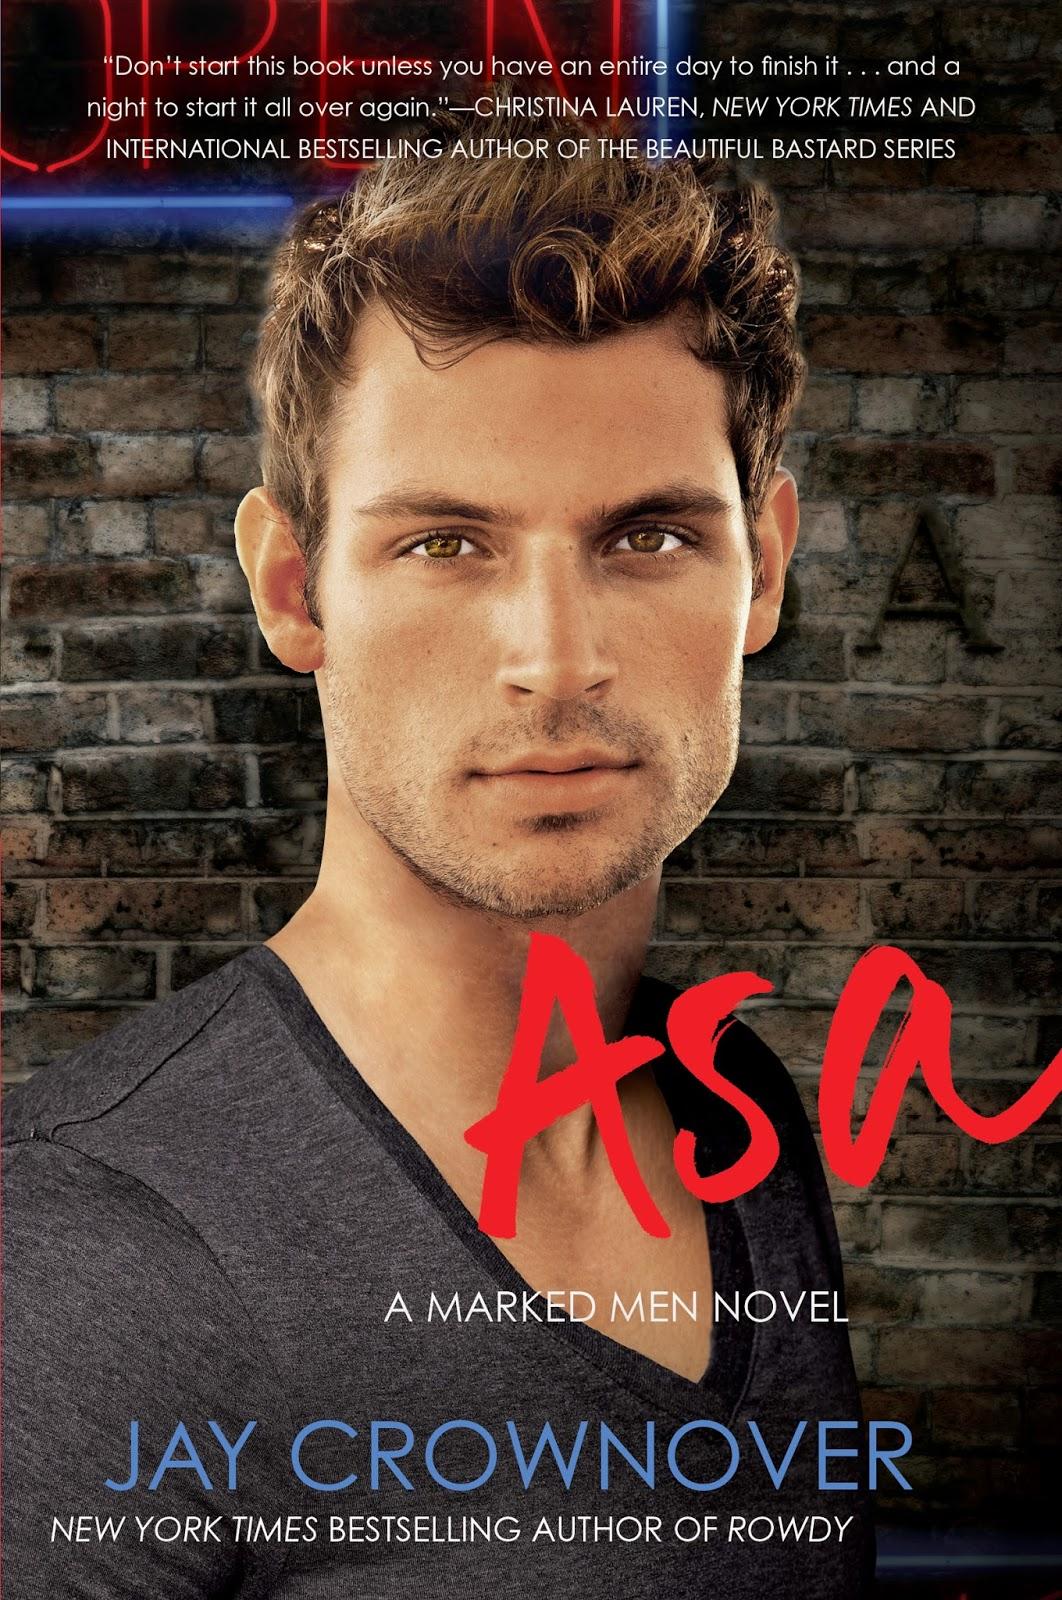 A Marked Men Romance Novel